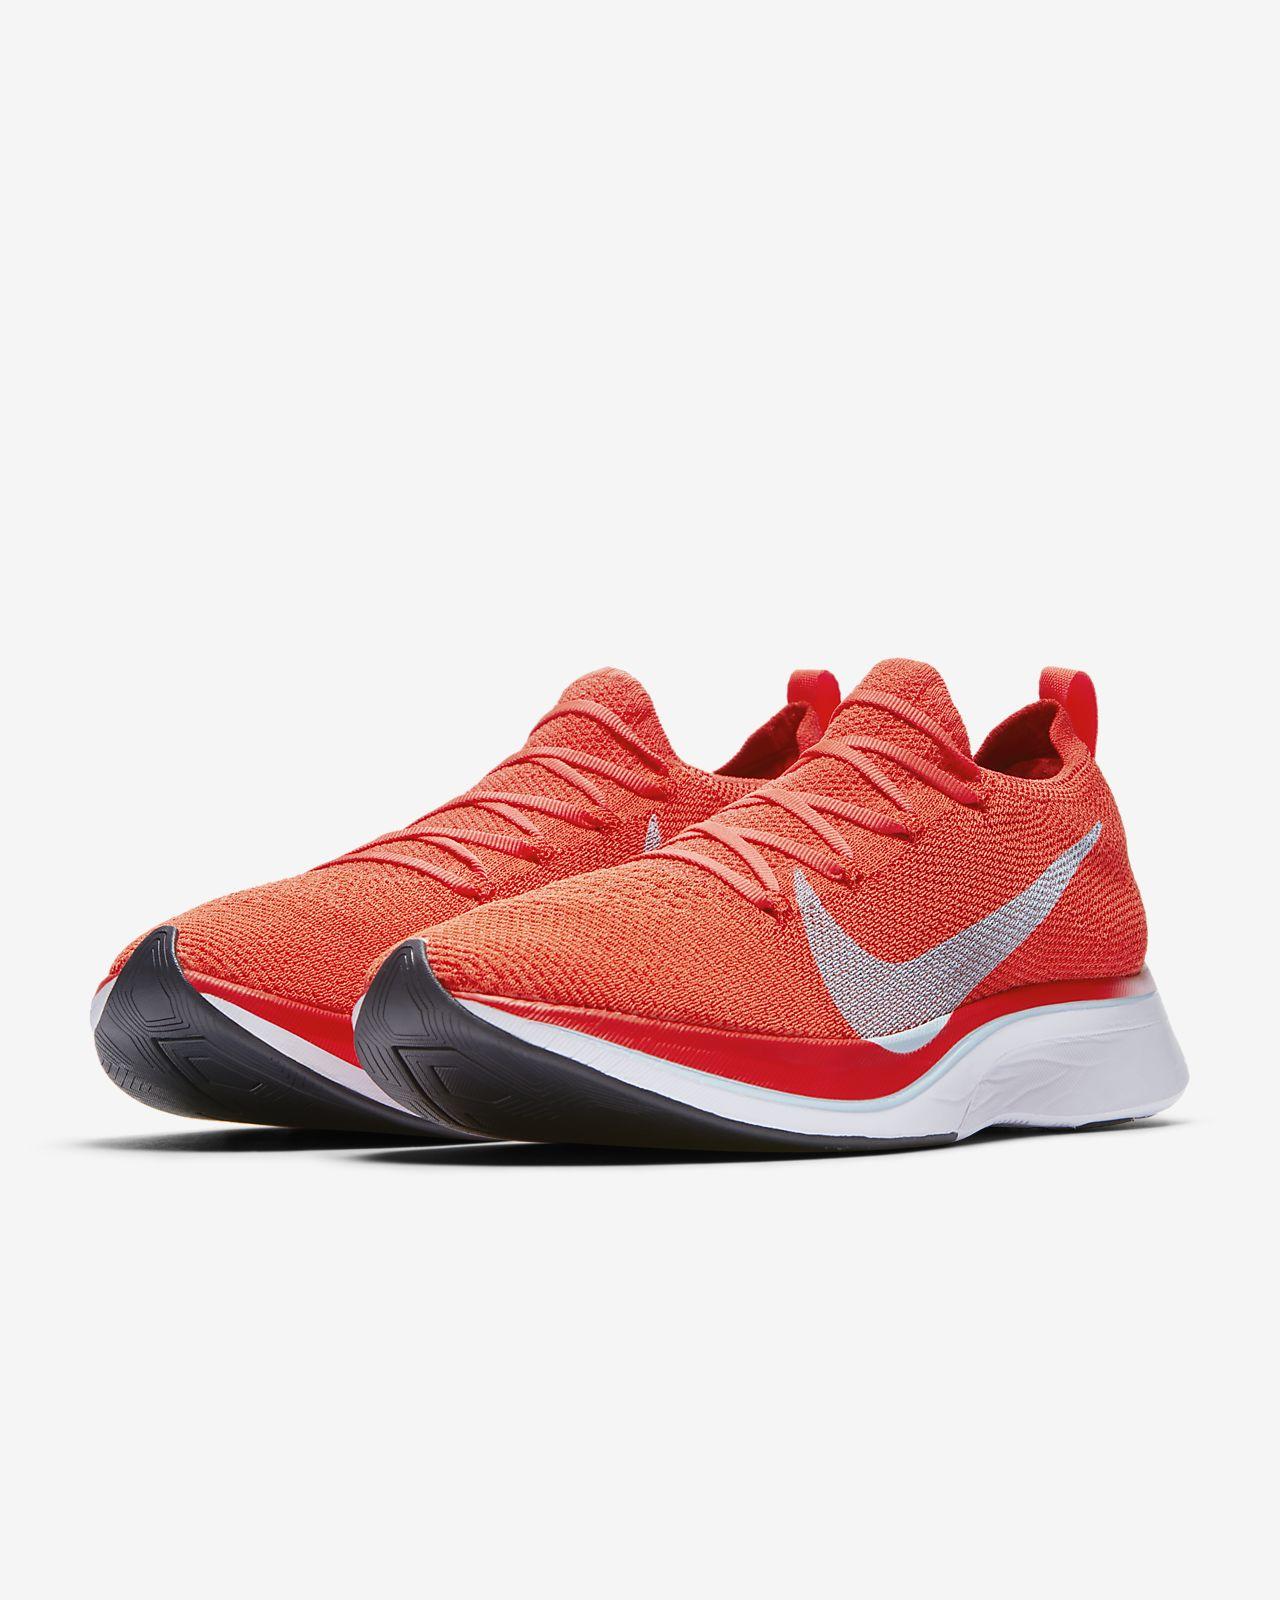 Nike Zoom Vaporfly 4% Kaufen Laufschuhe Herren Blau